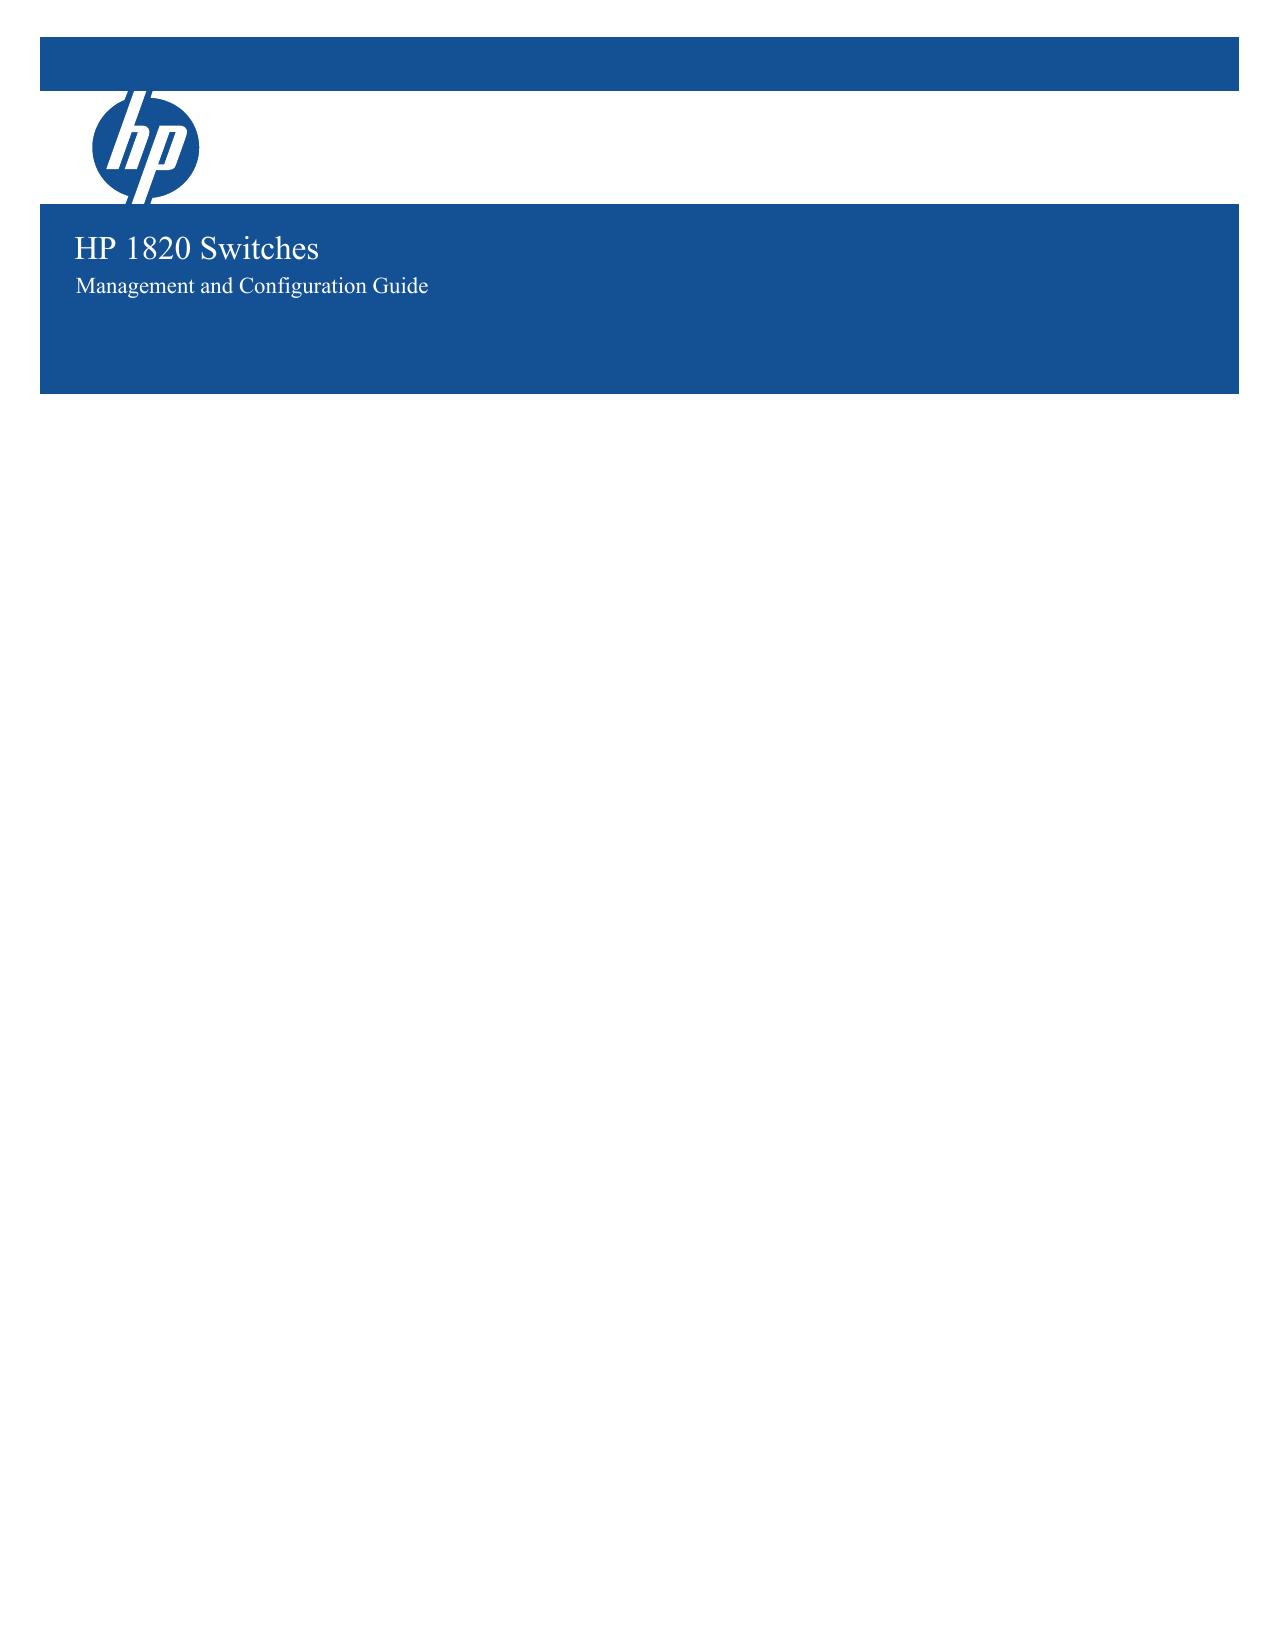 HP 1810-48G Management and Configuration Guide | manualzz com